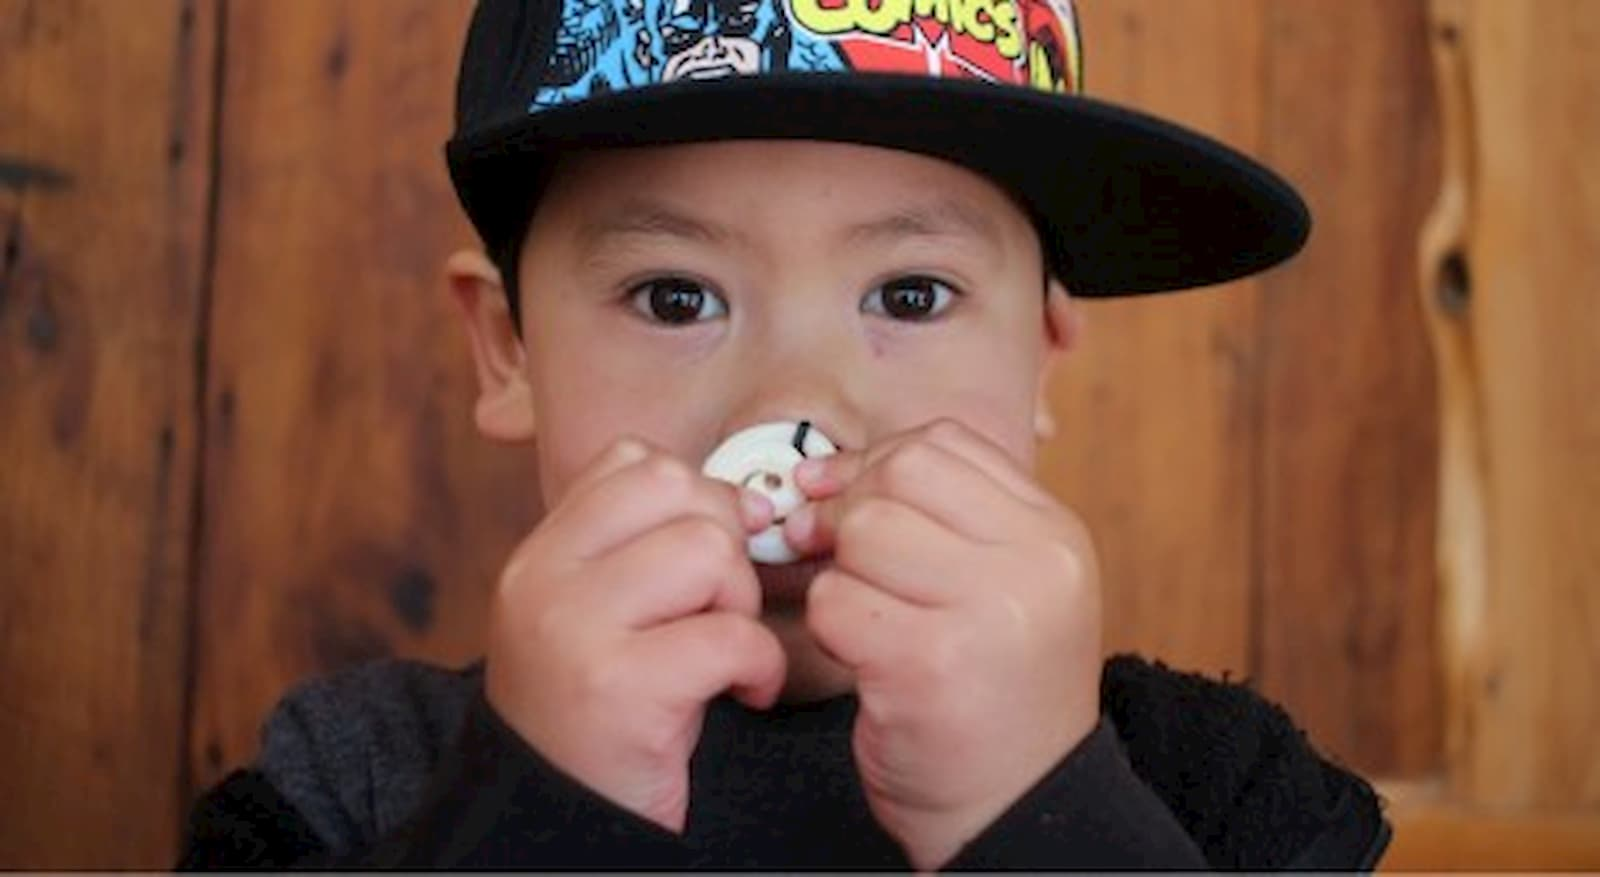 Māori children in New Zealand